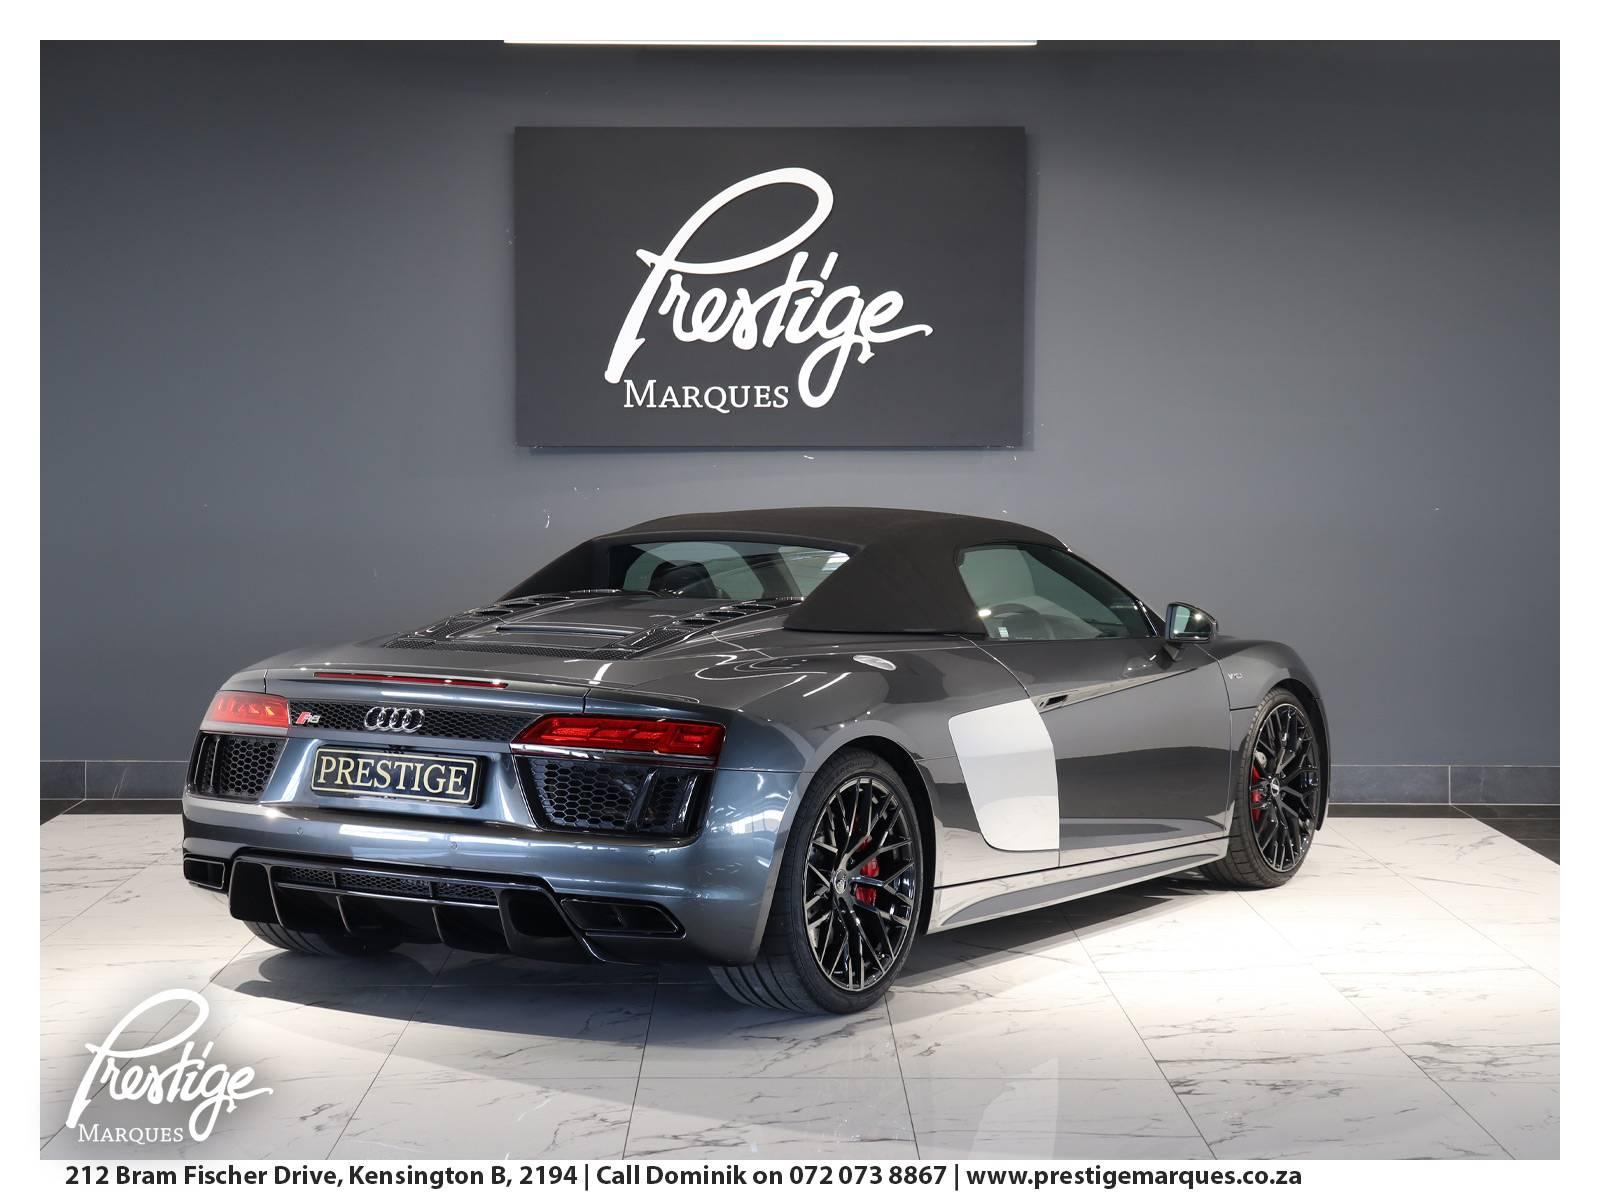 2019-Audi-R8-Prestige-Marques-Randburg-Sandton-7